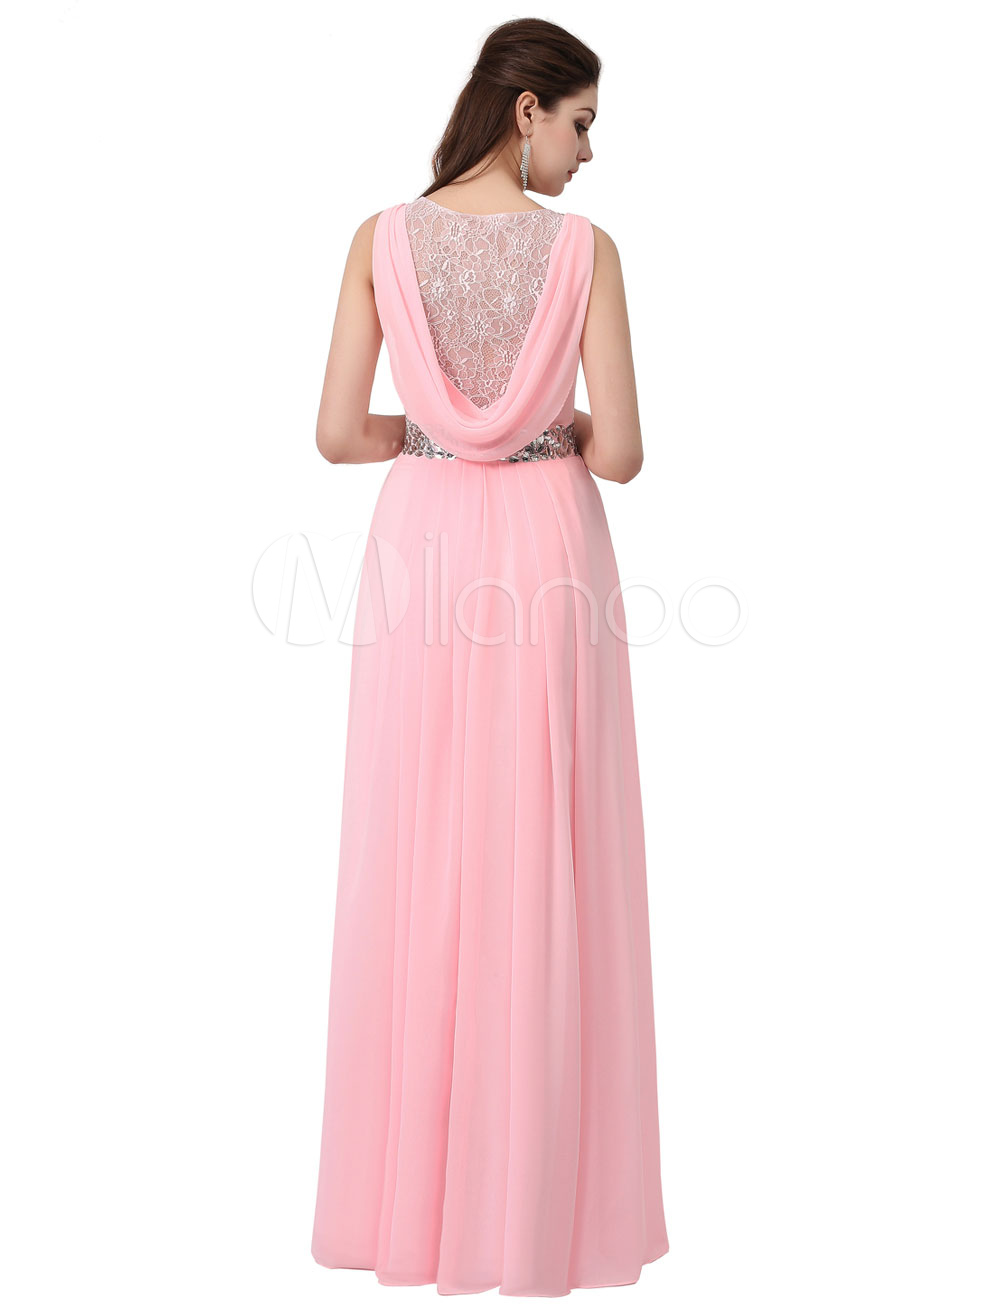 2d06f3a439b4c ... Blush Prom Dress Long Bridesmaid Dress Soft Pink Chiffon Rhinestone  Lace Back A Line Floor Length ...